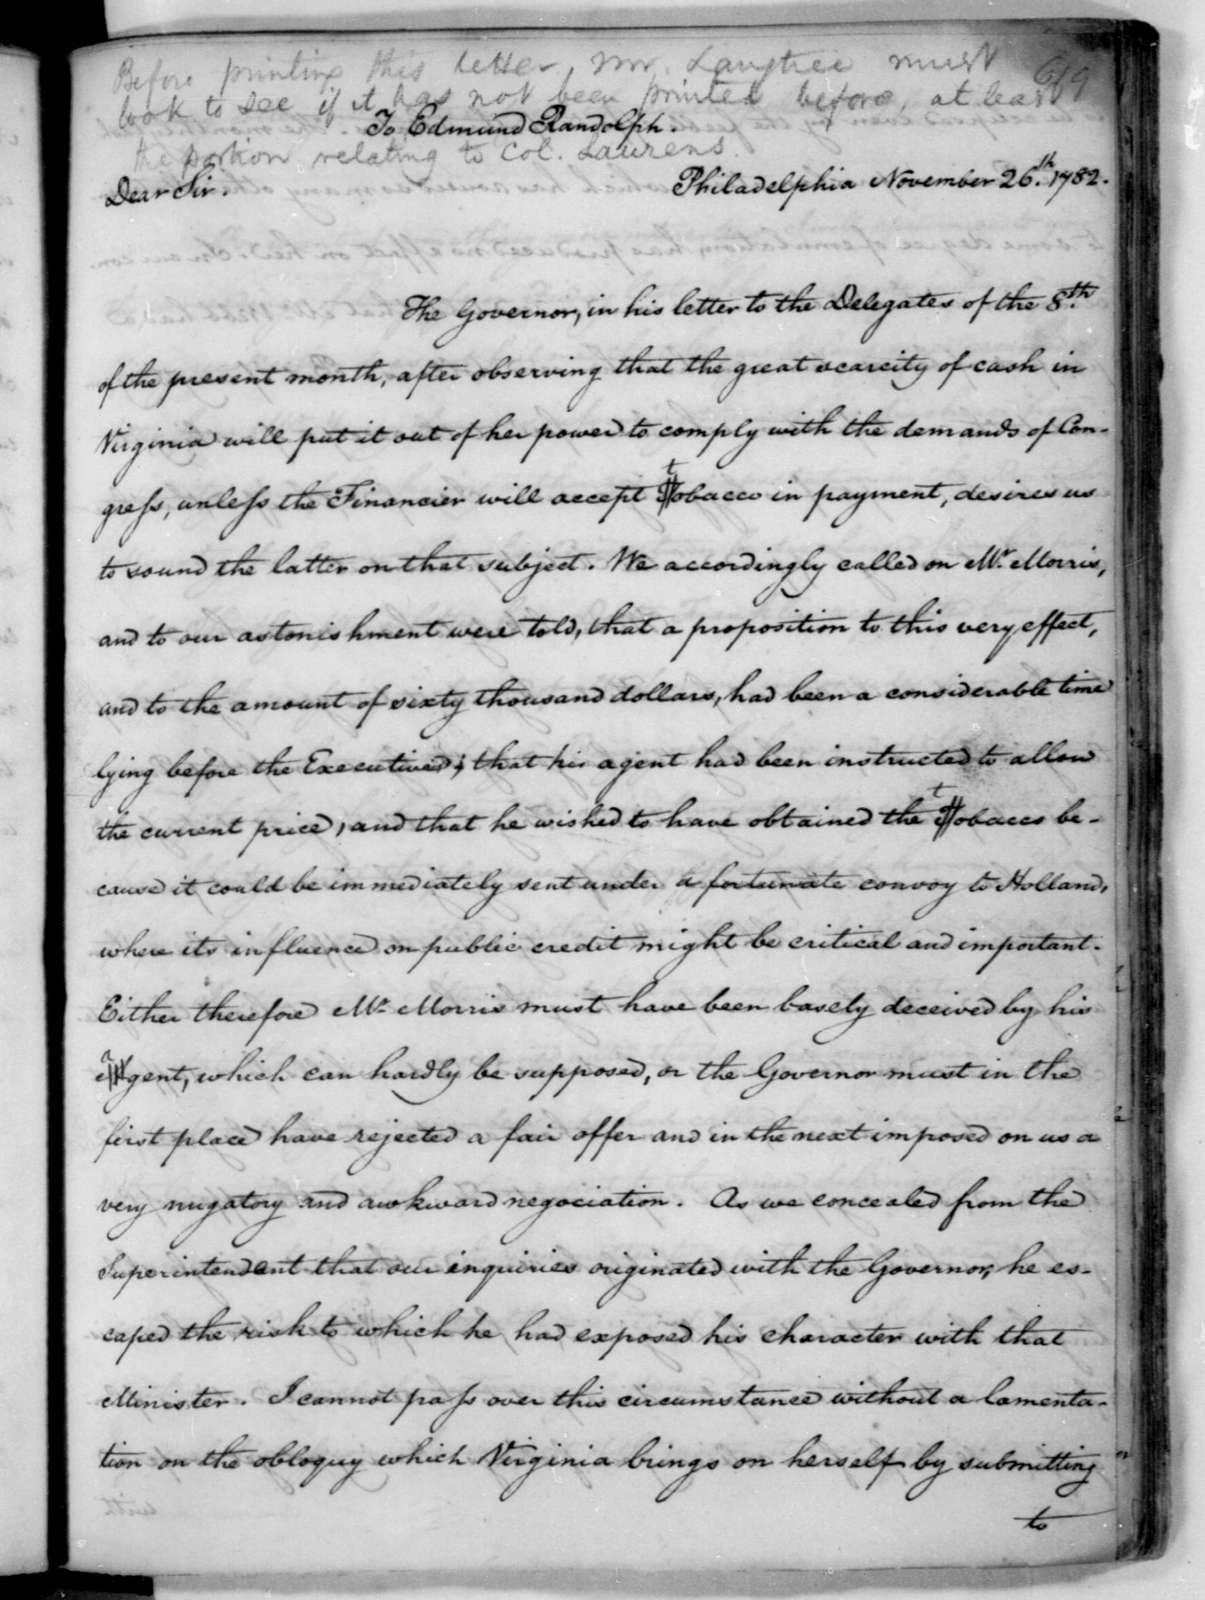 James Madison to Edmund Randolph, November 26, 1782.